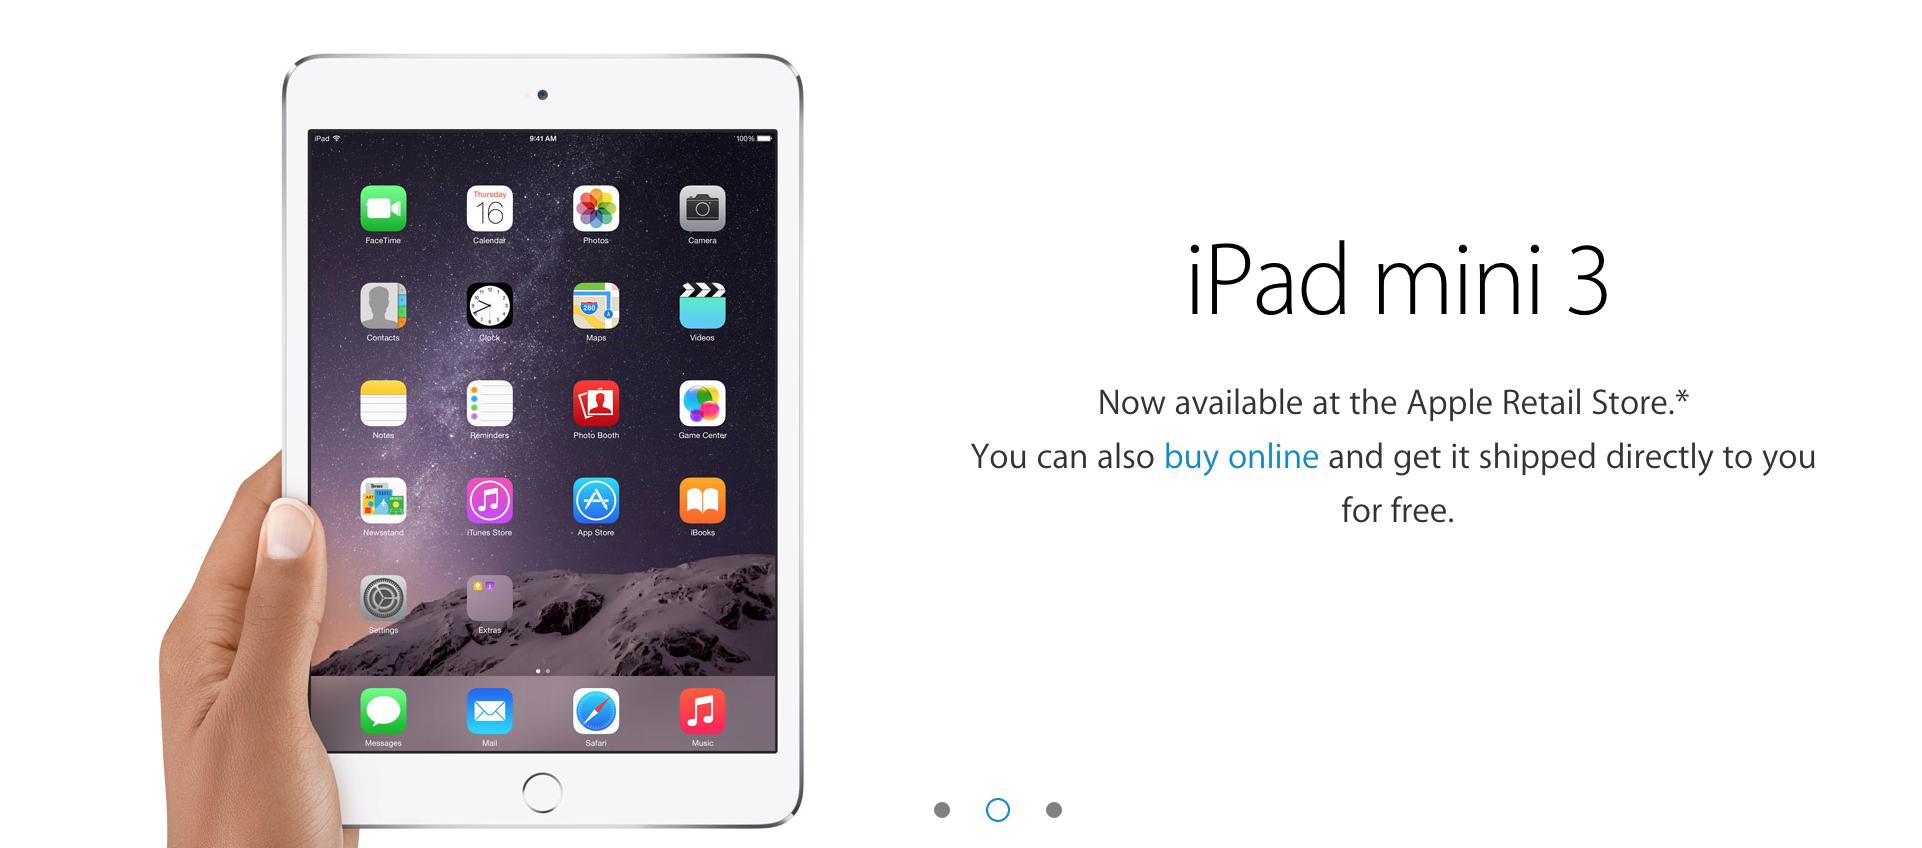 iPad mini 3 Apple retail store